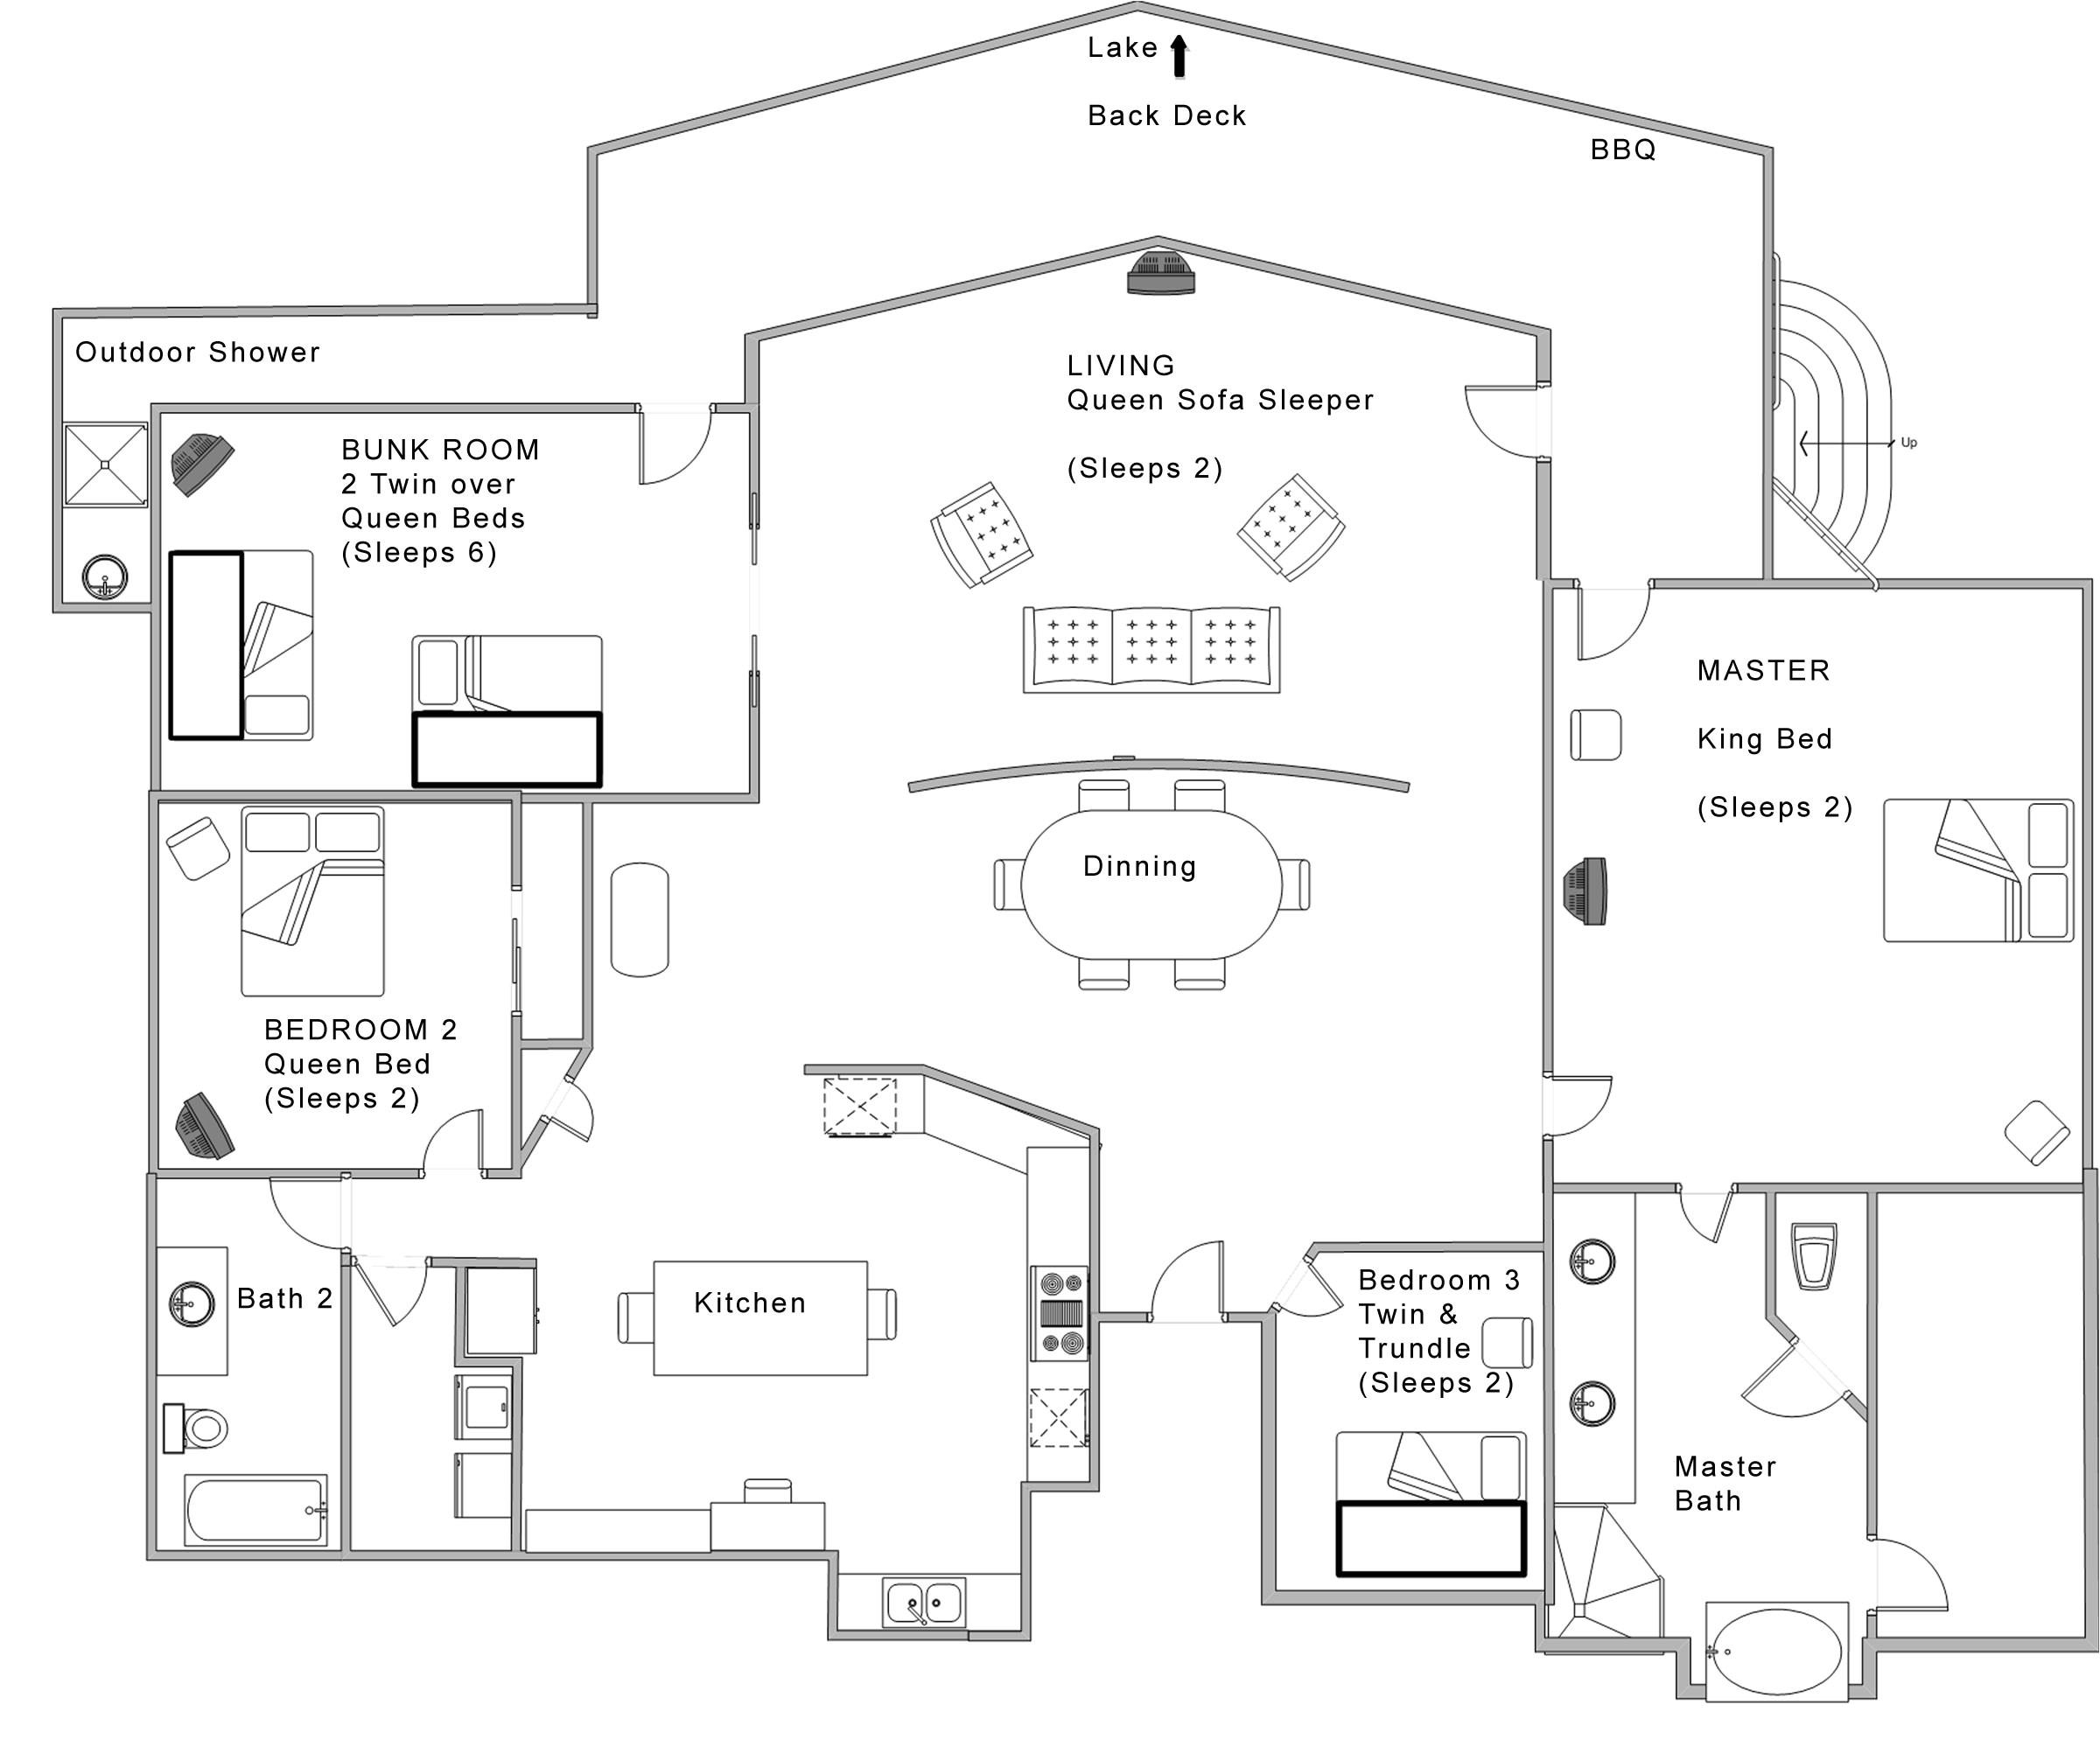 best open floor plan home designs beauteous decor open floor house plans contemporary best open floor plan home designs